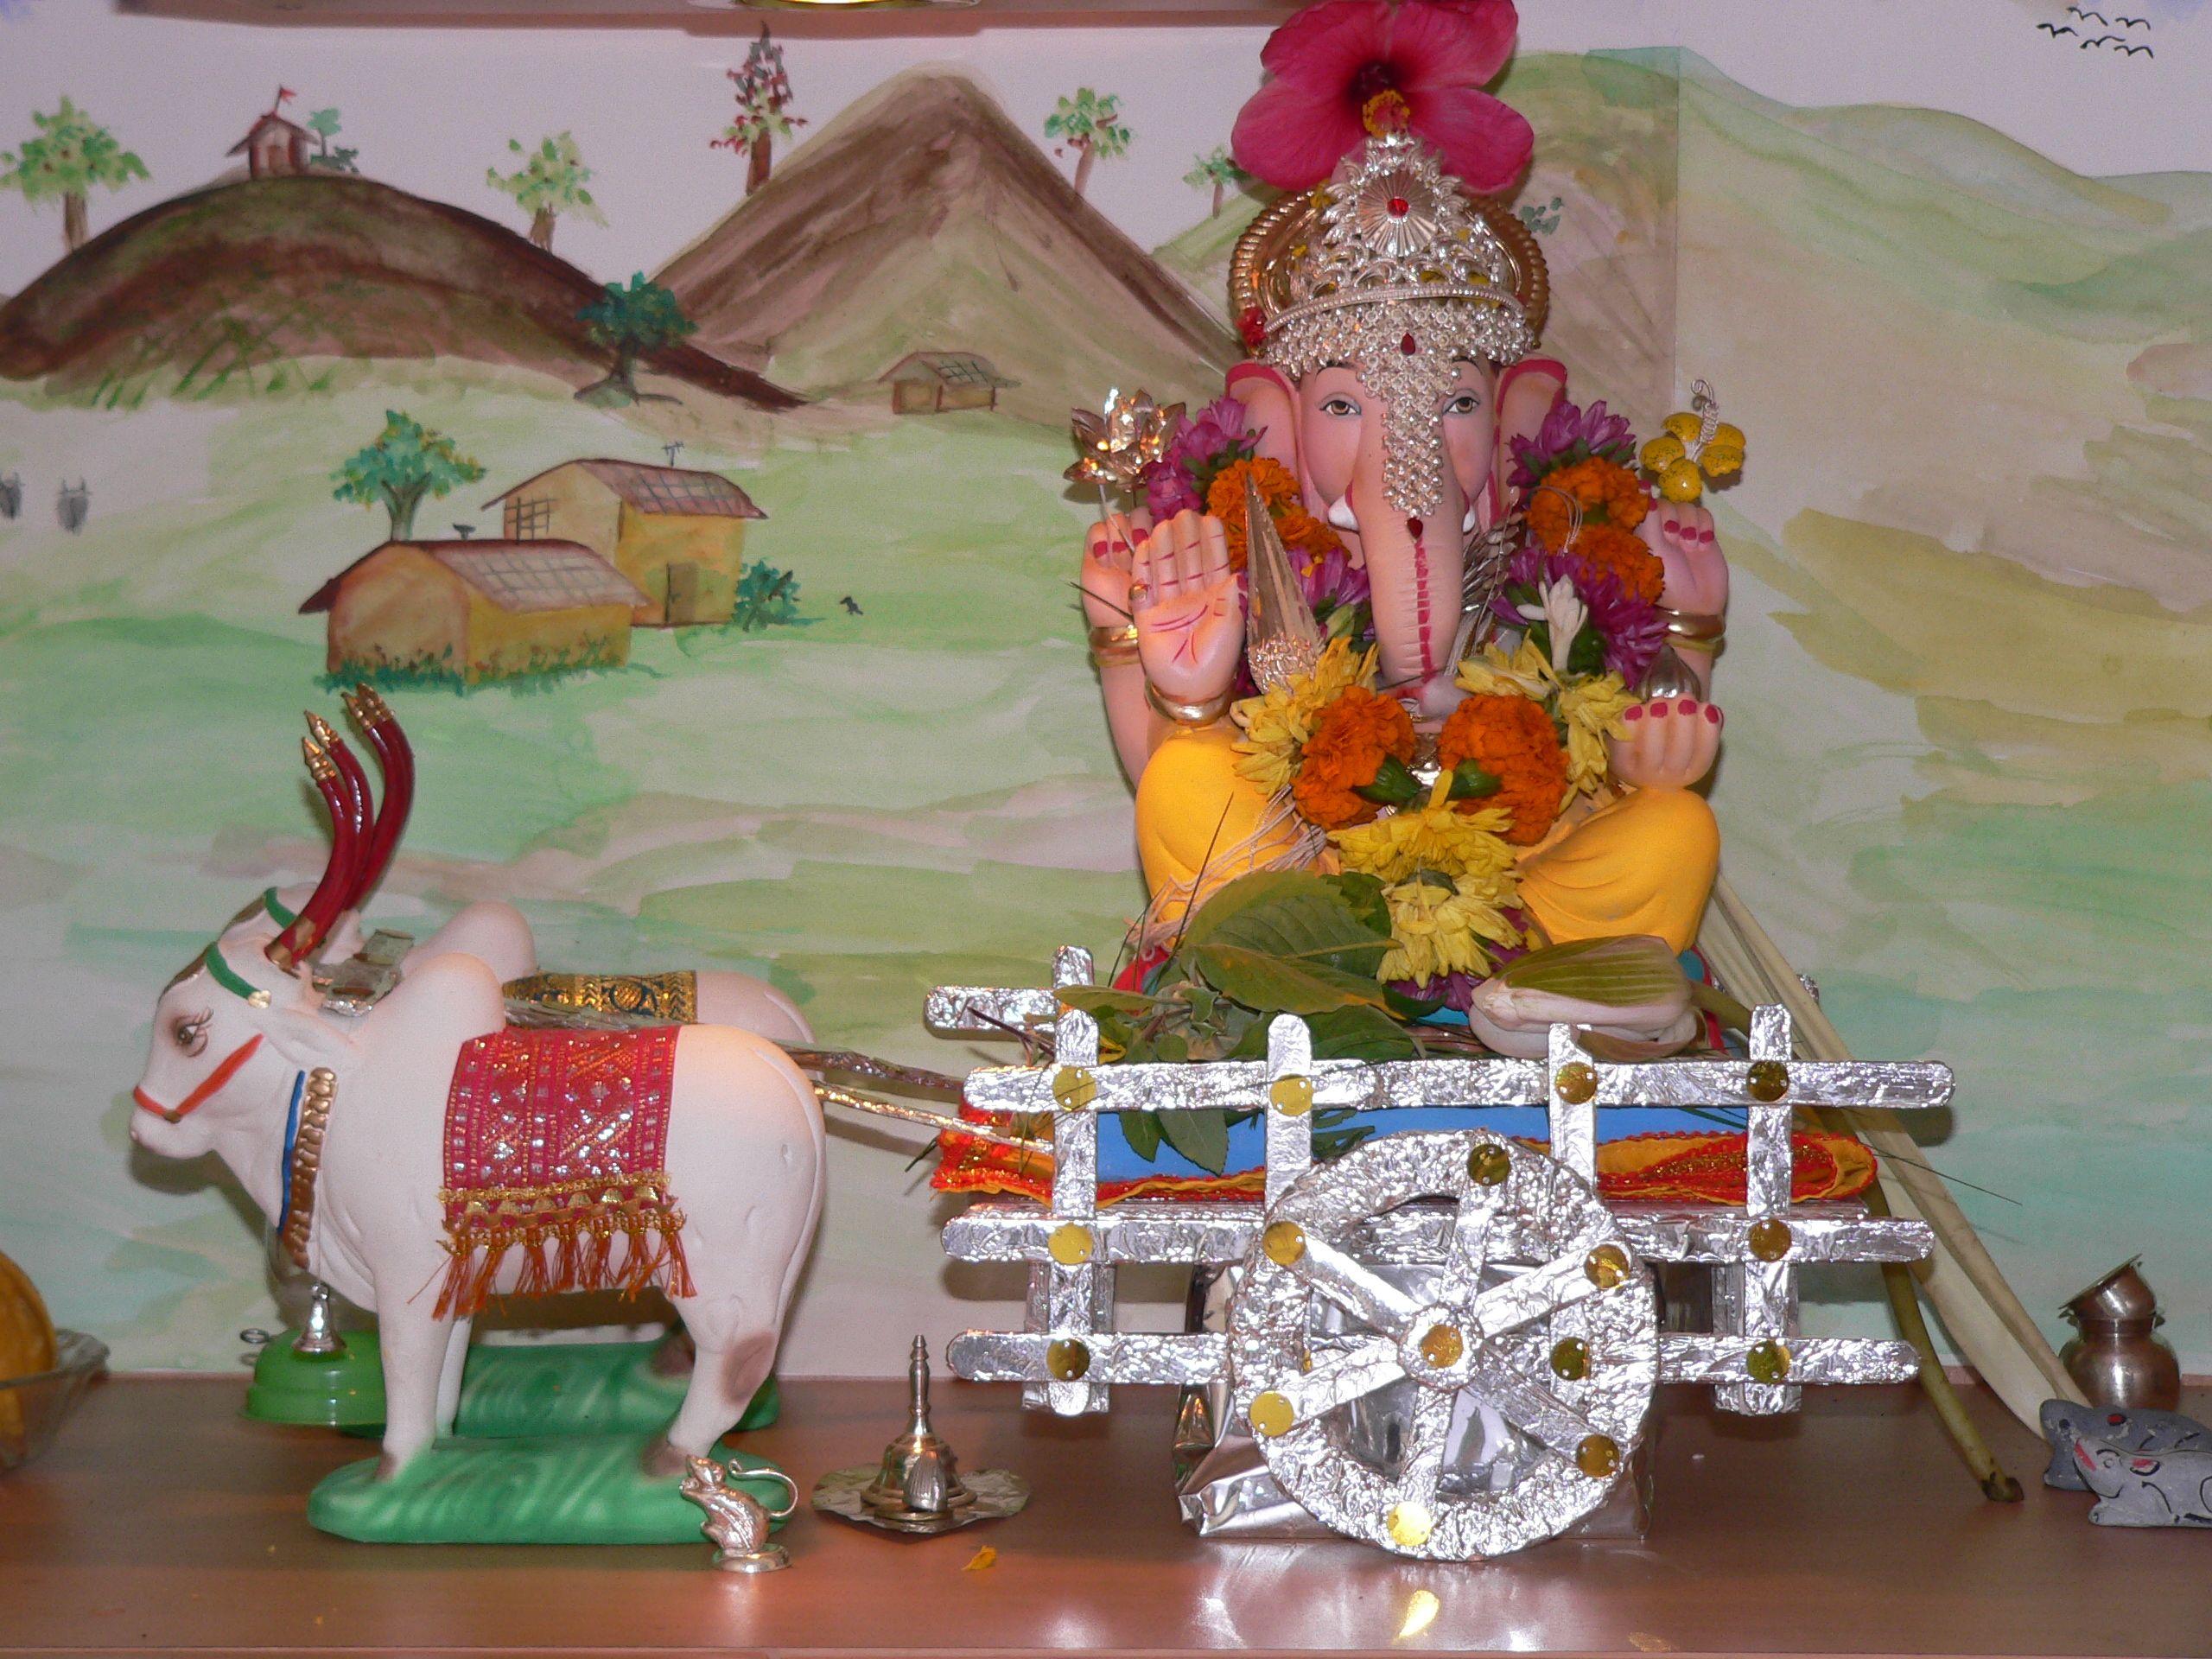 Village Theme Bullock Cart Decoration For Ganpati